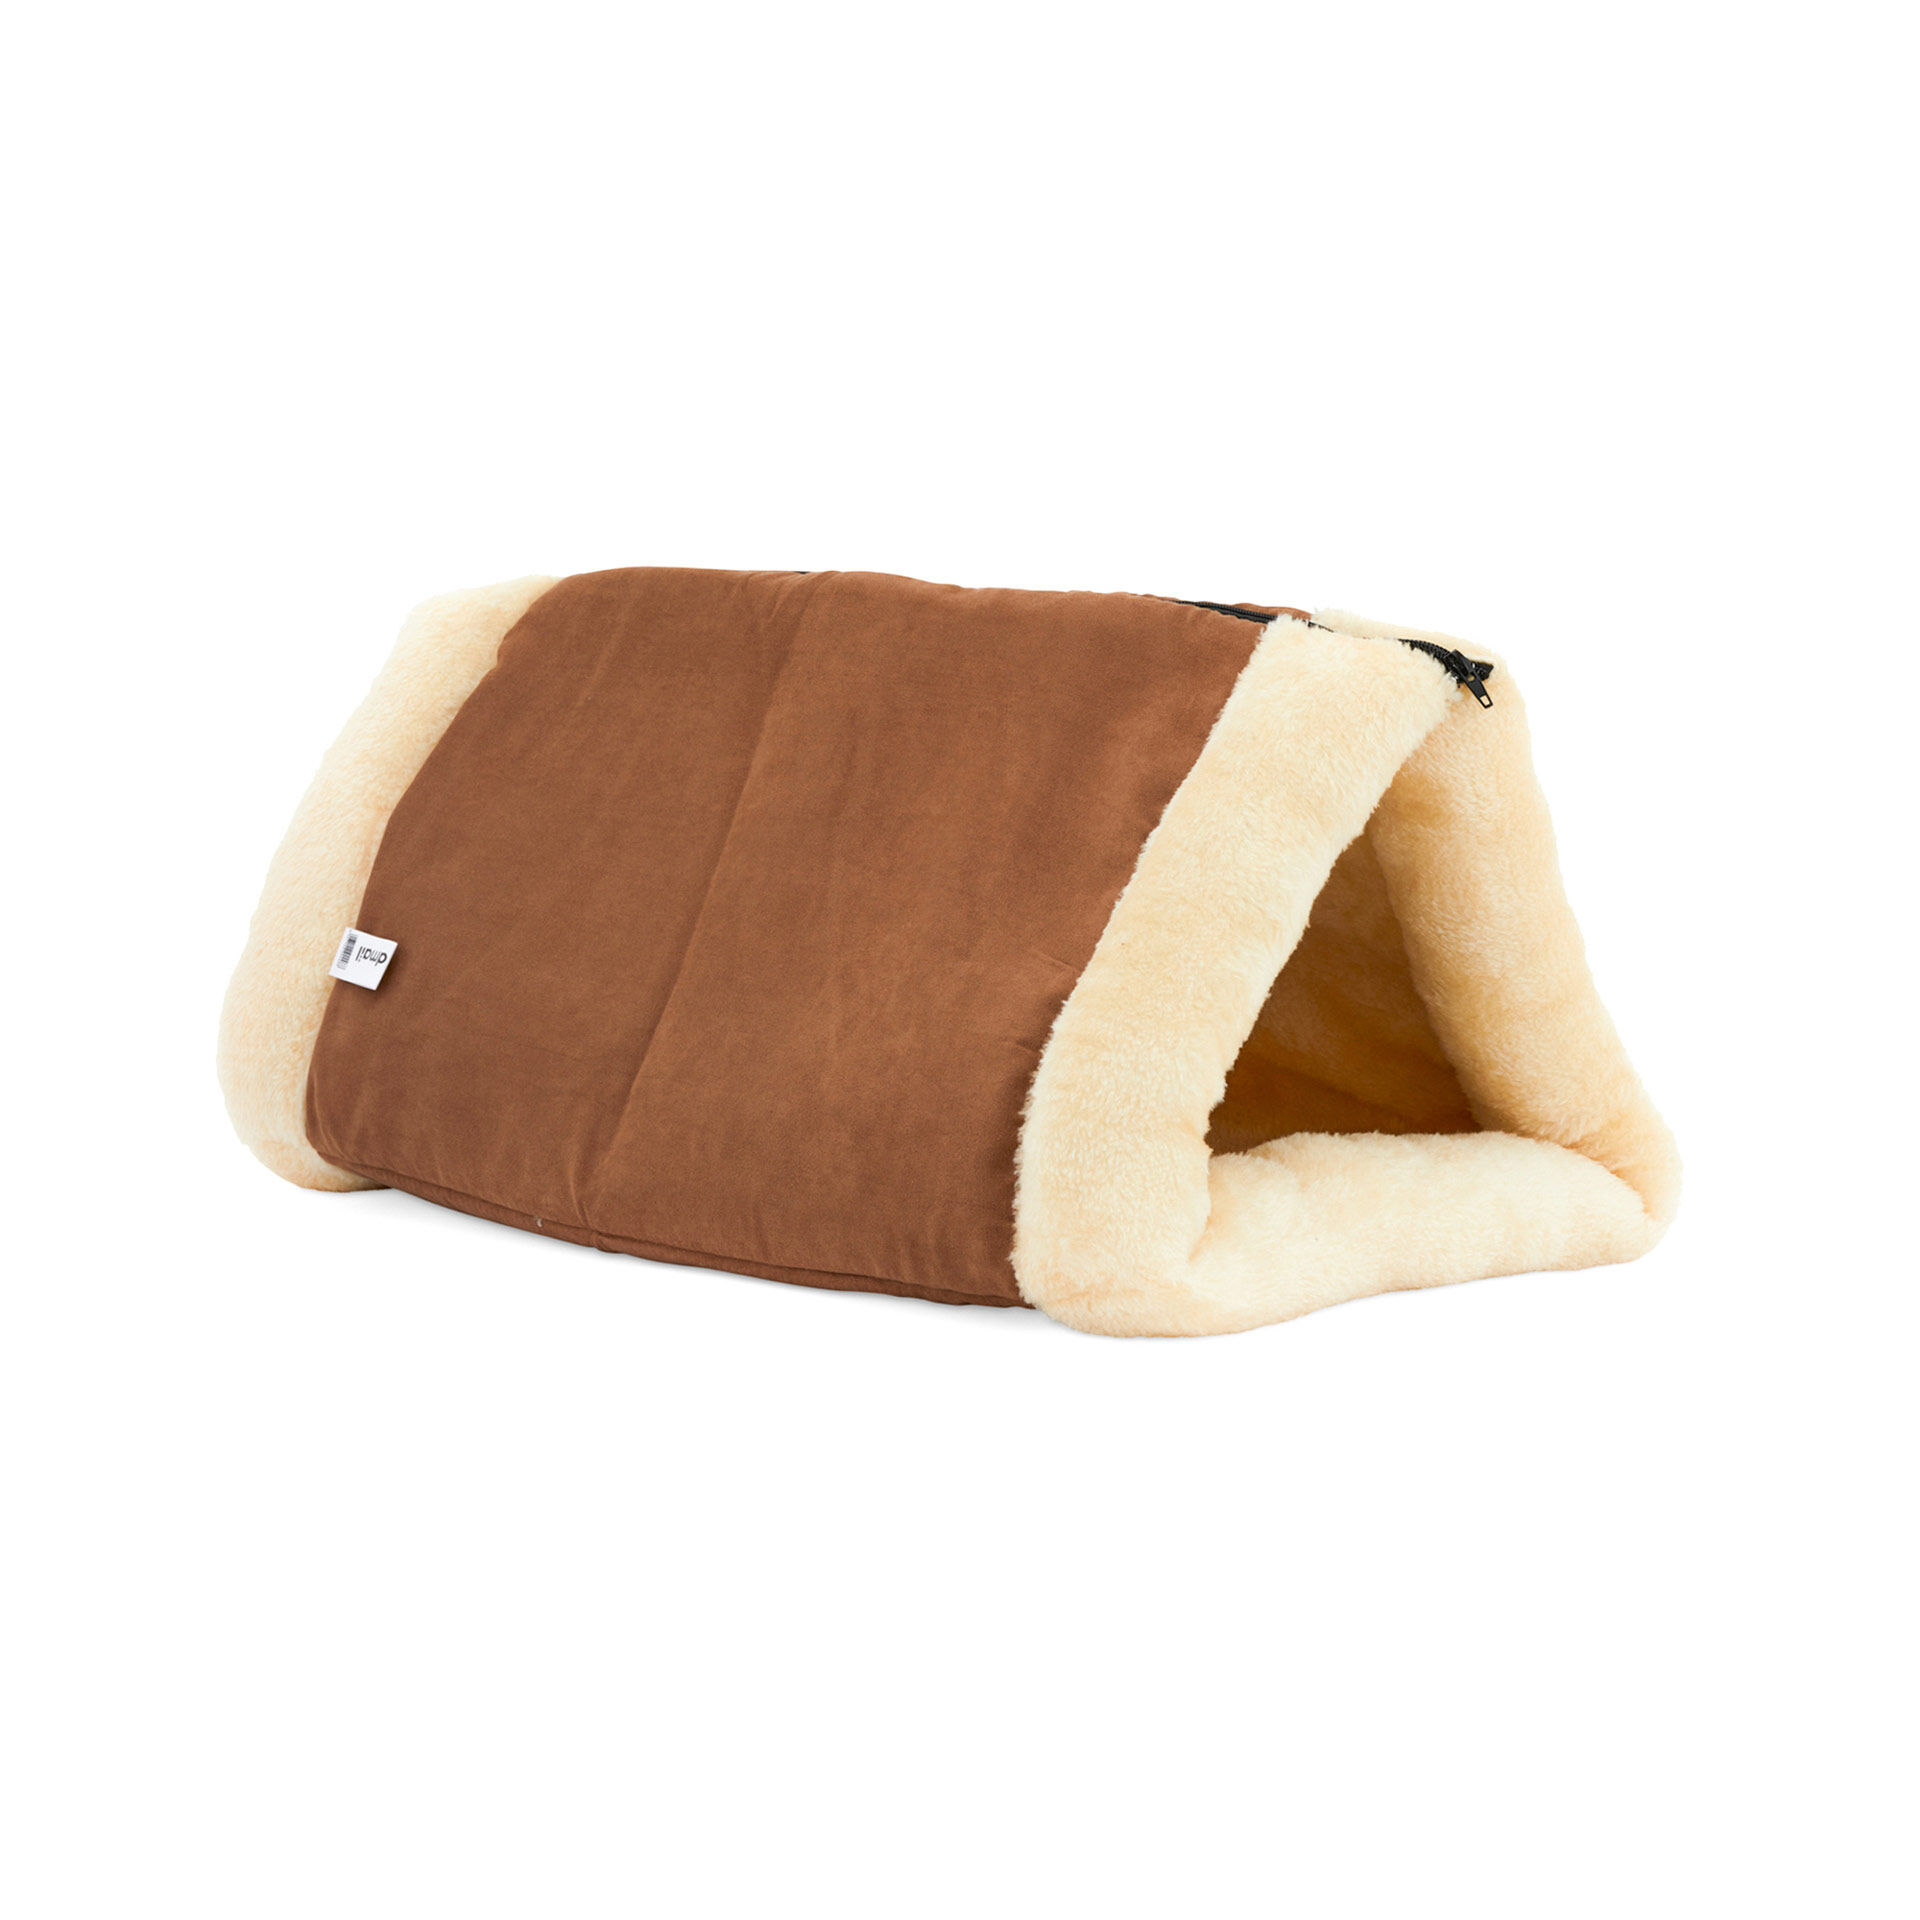 Tunnel + tapis pour chats 2 en 1, , large